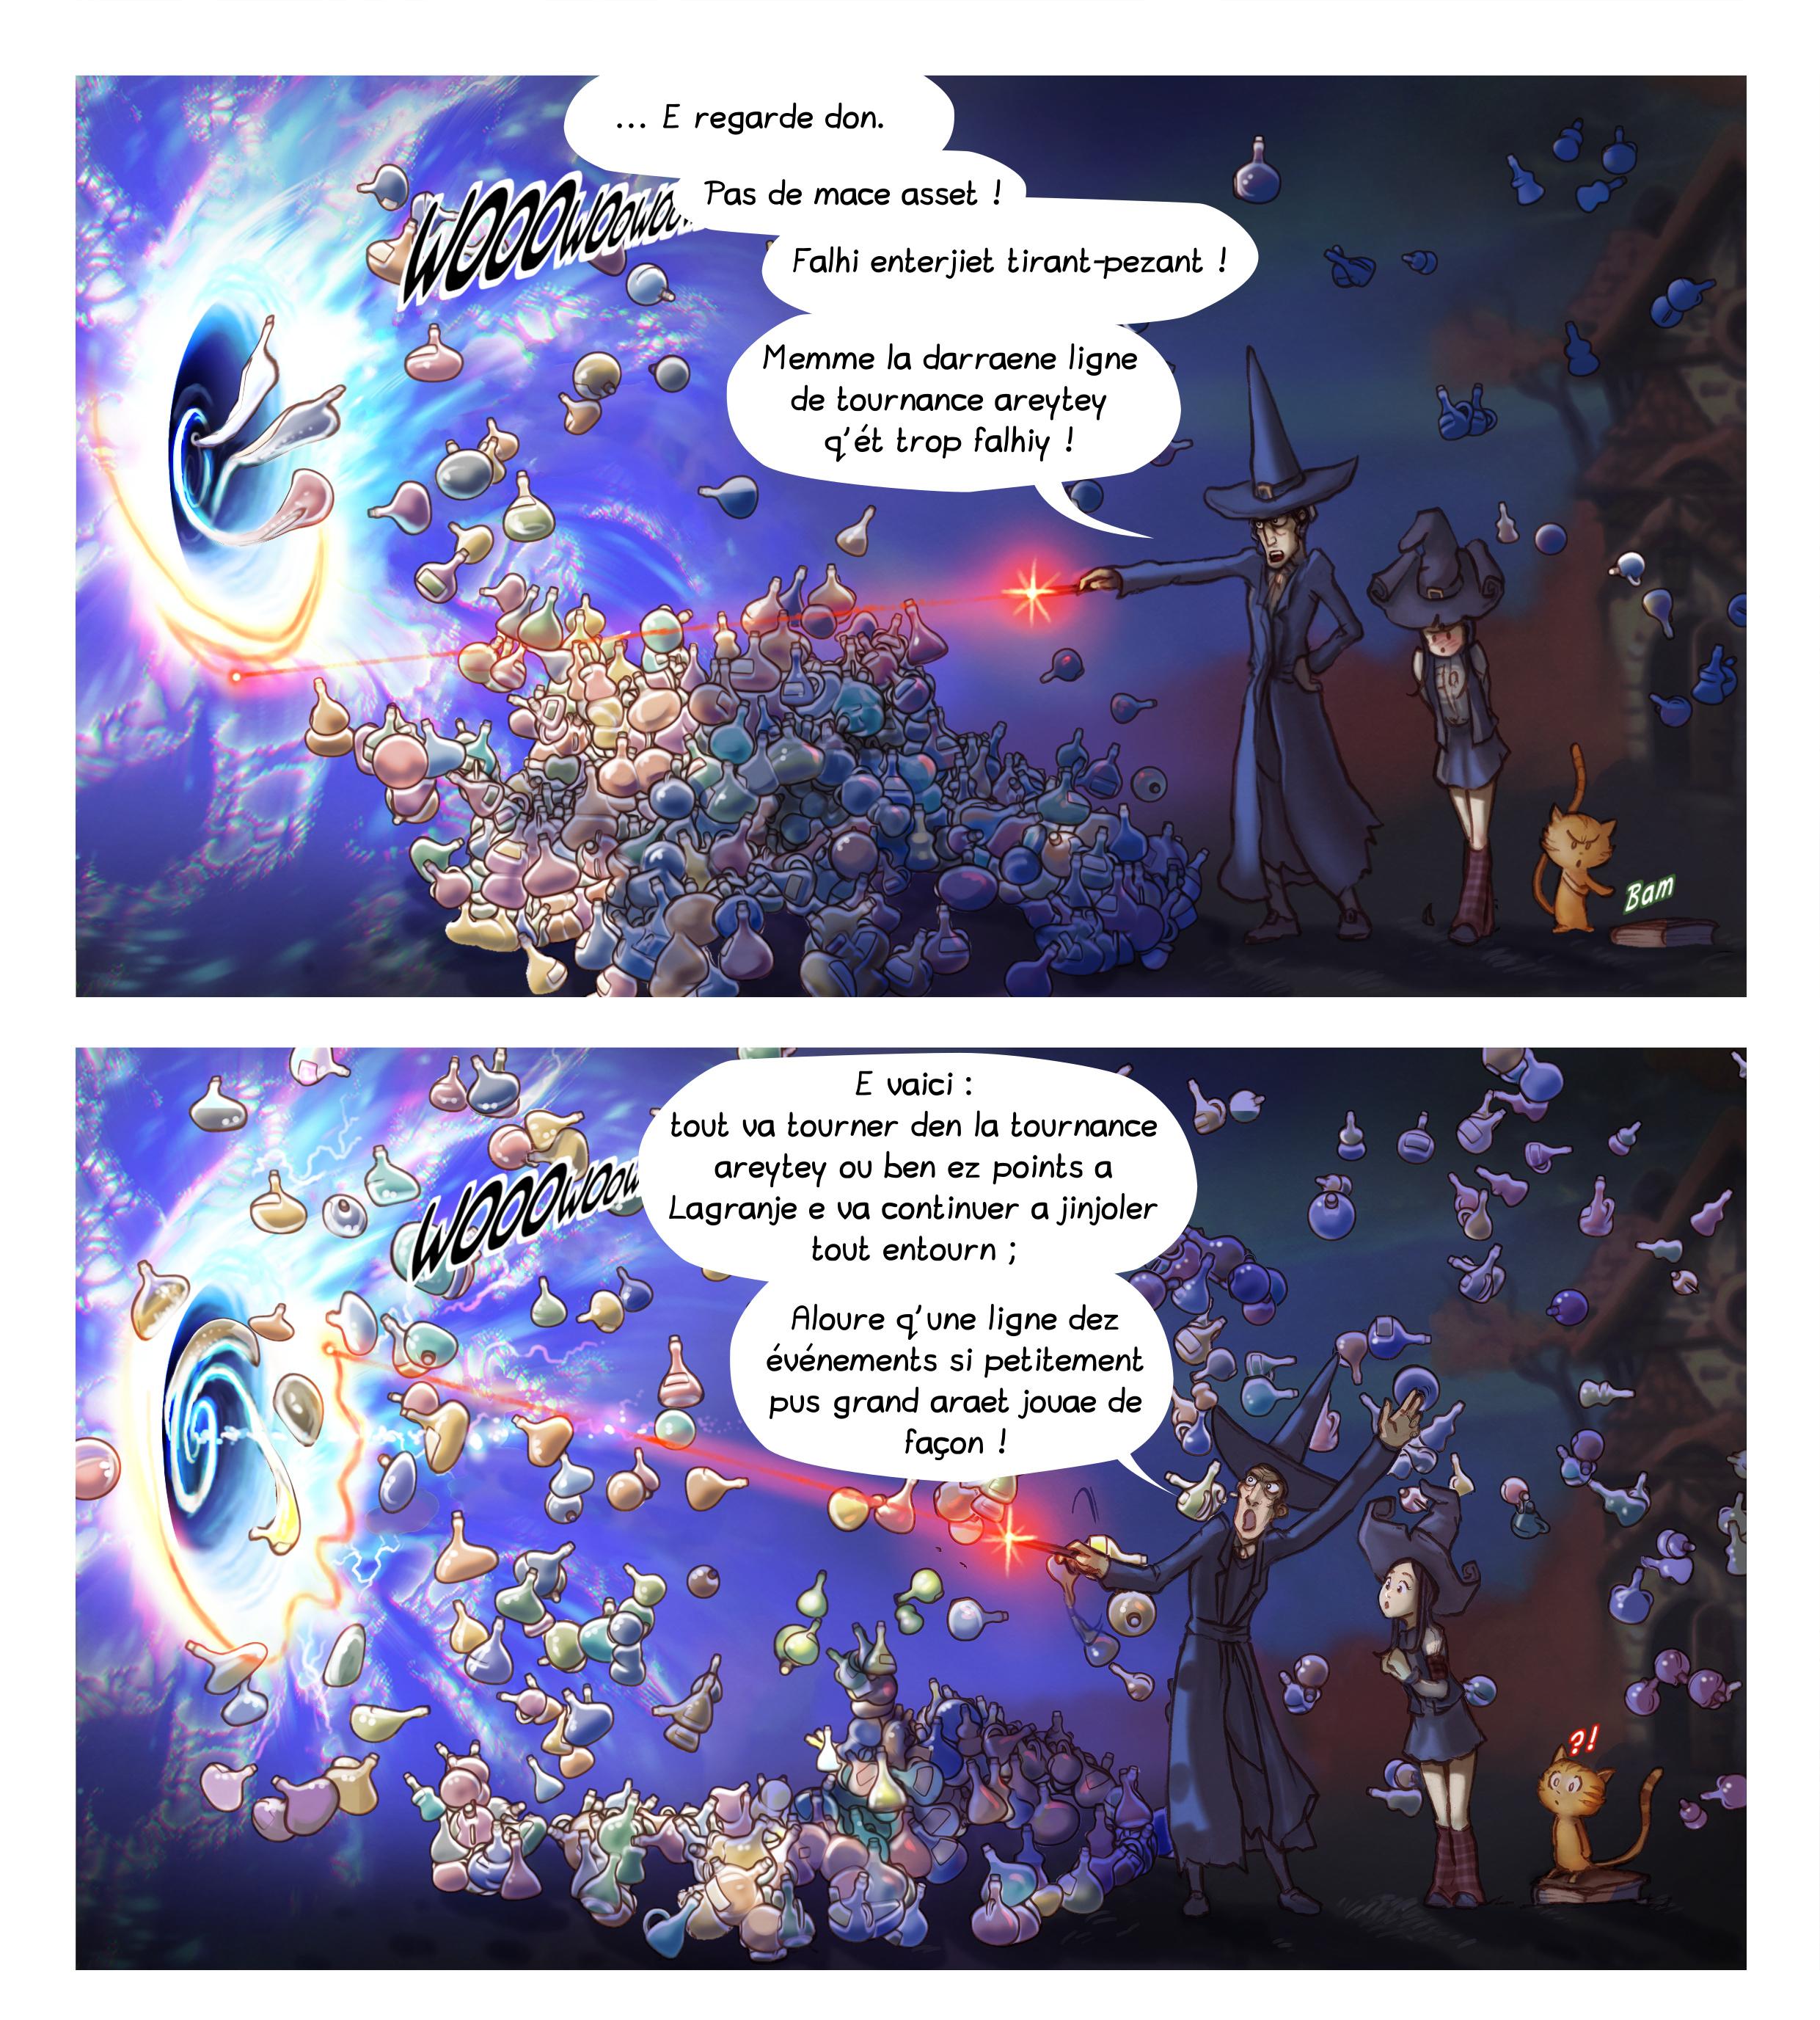 Eqerouey 12 : Menaije de basse-saezon, Page 5